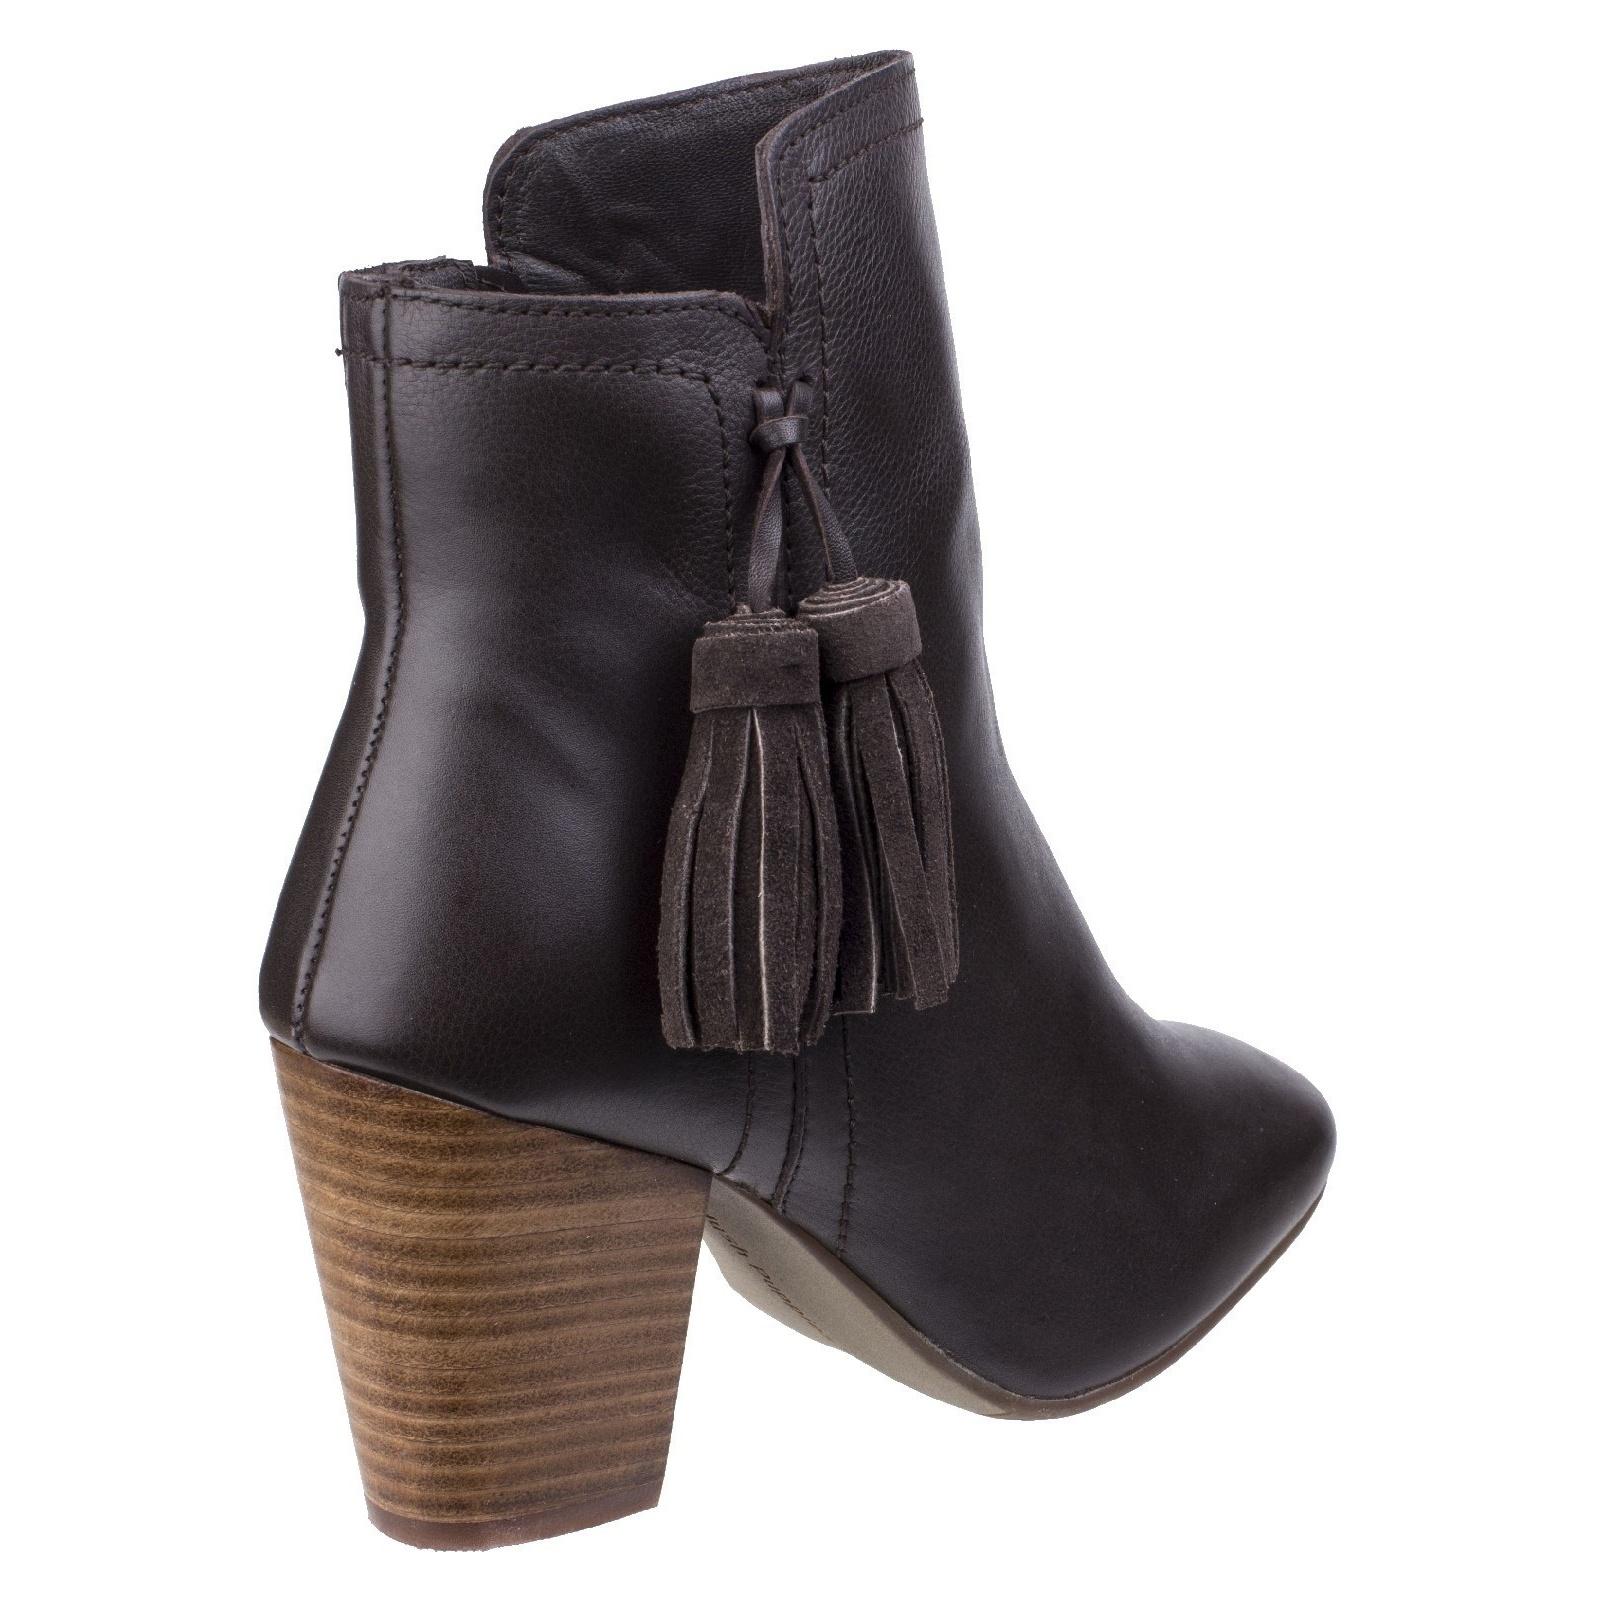 Hush Puppies - botas a los tobillos tobillos tobillos modelo Daisee Billie para mujer (FS4878) fc796d